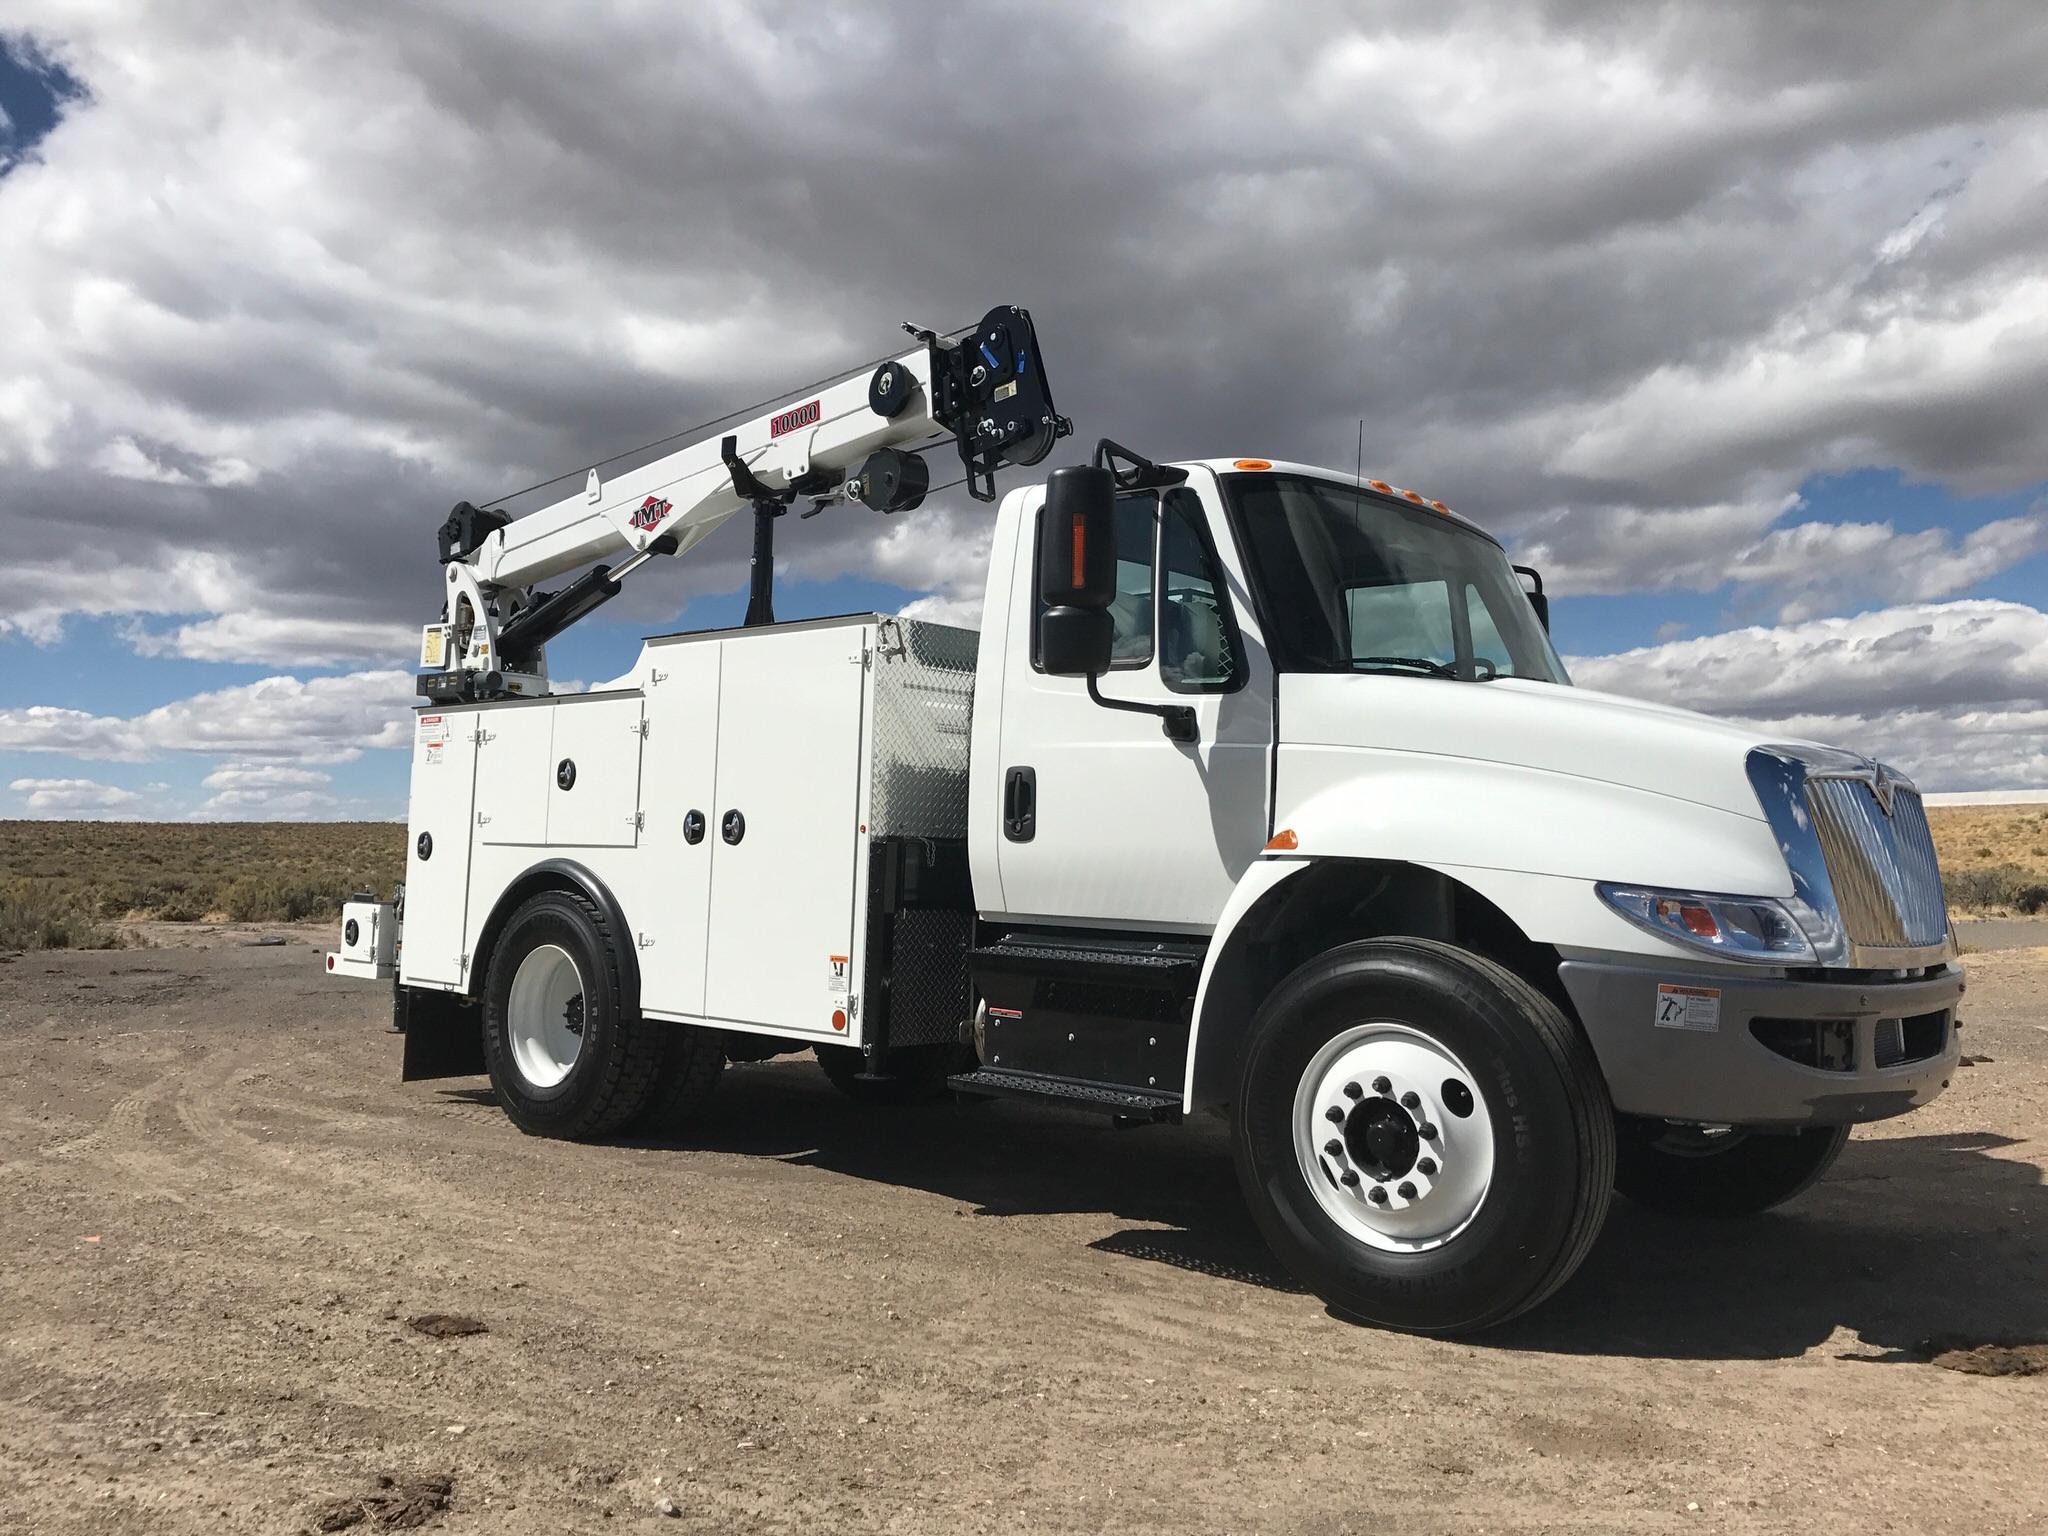 2018 International IMT DOM II body 10,000 lb crans CAS40 Compressor.jpg